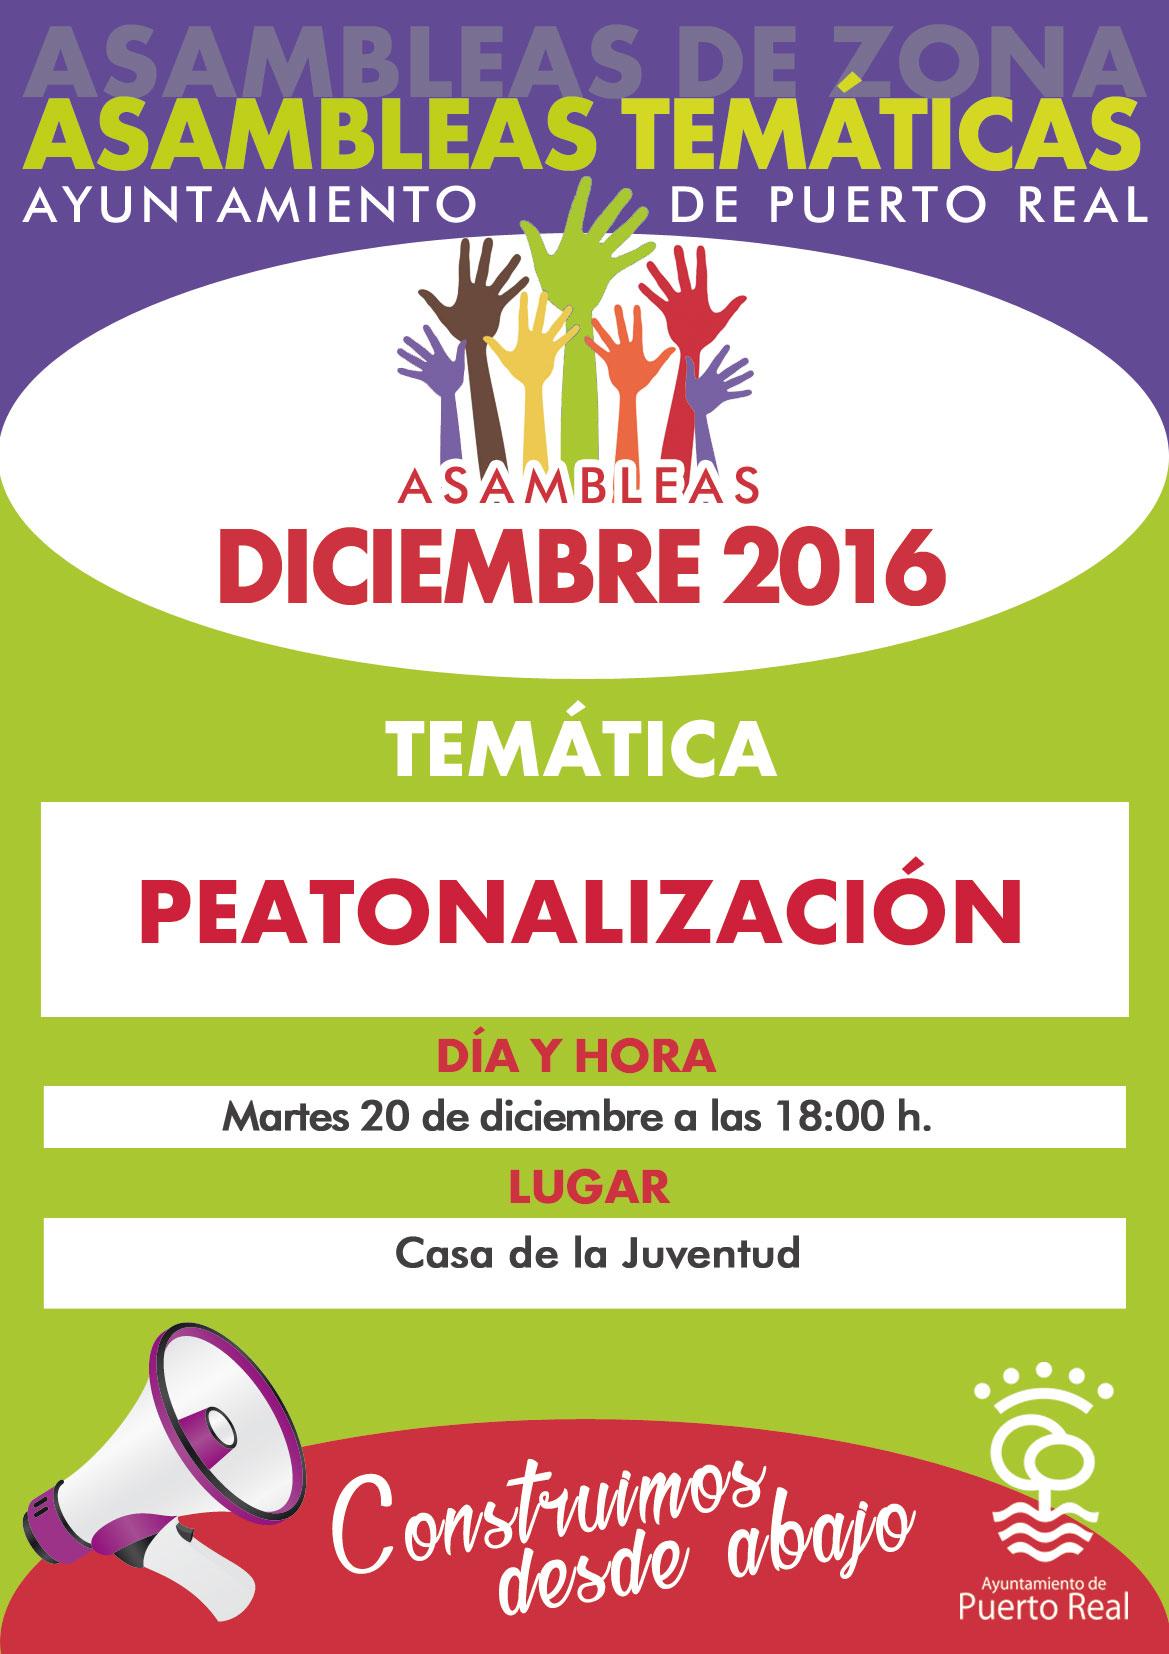 cartelasambleastematicas-20dic2016-peatonalizacion